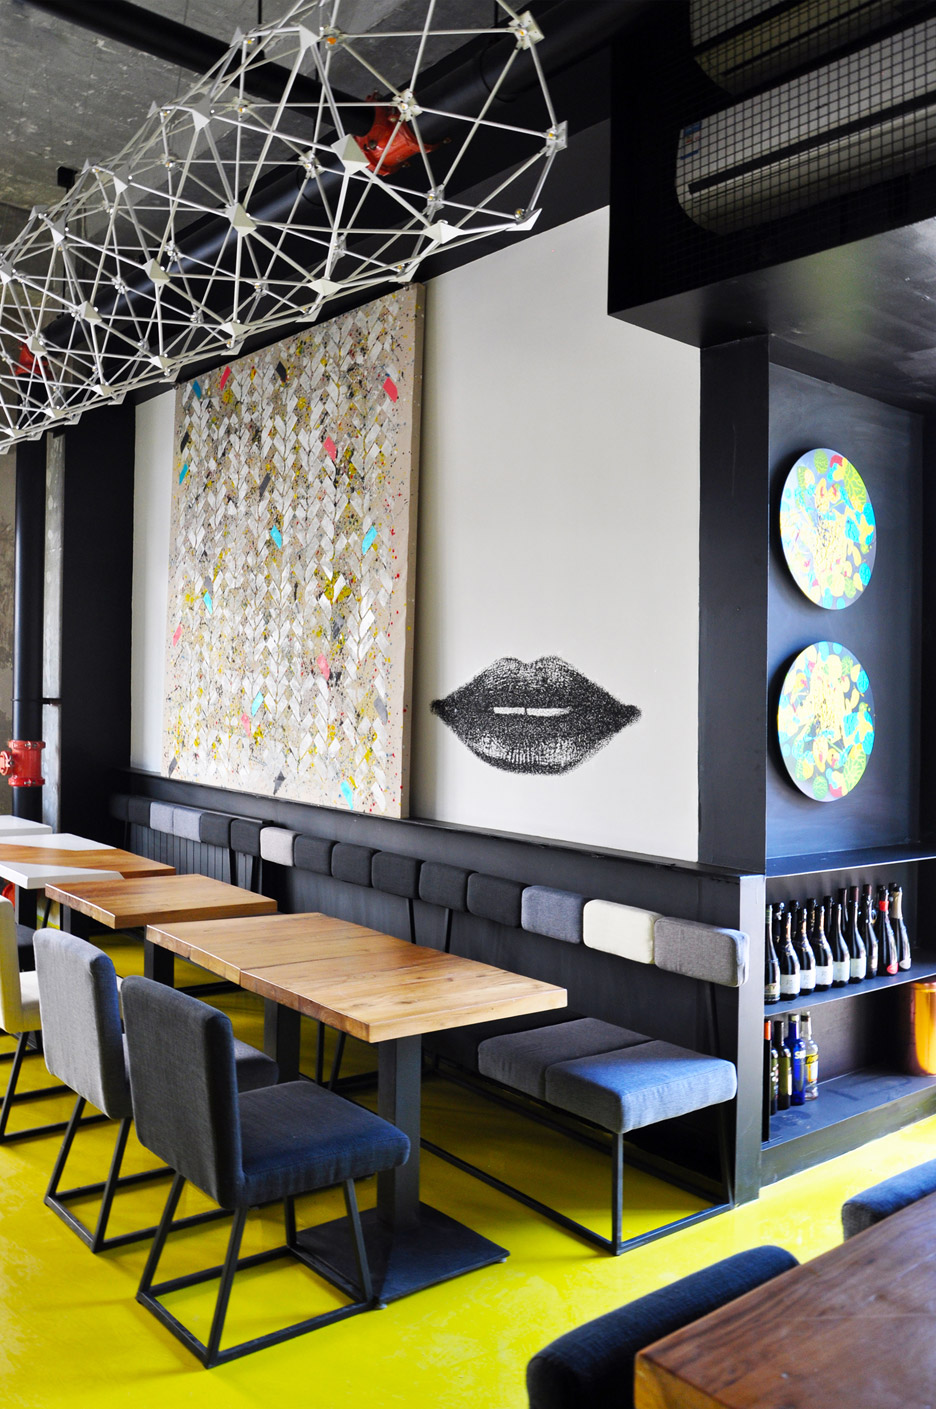 Studio ramoprimo creates chevron patterned brick walls